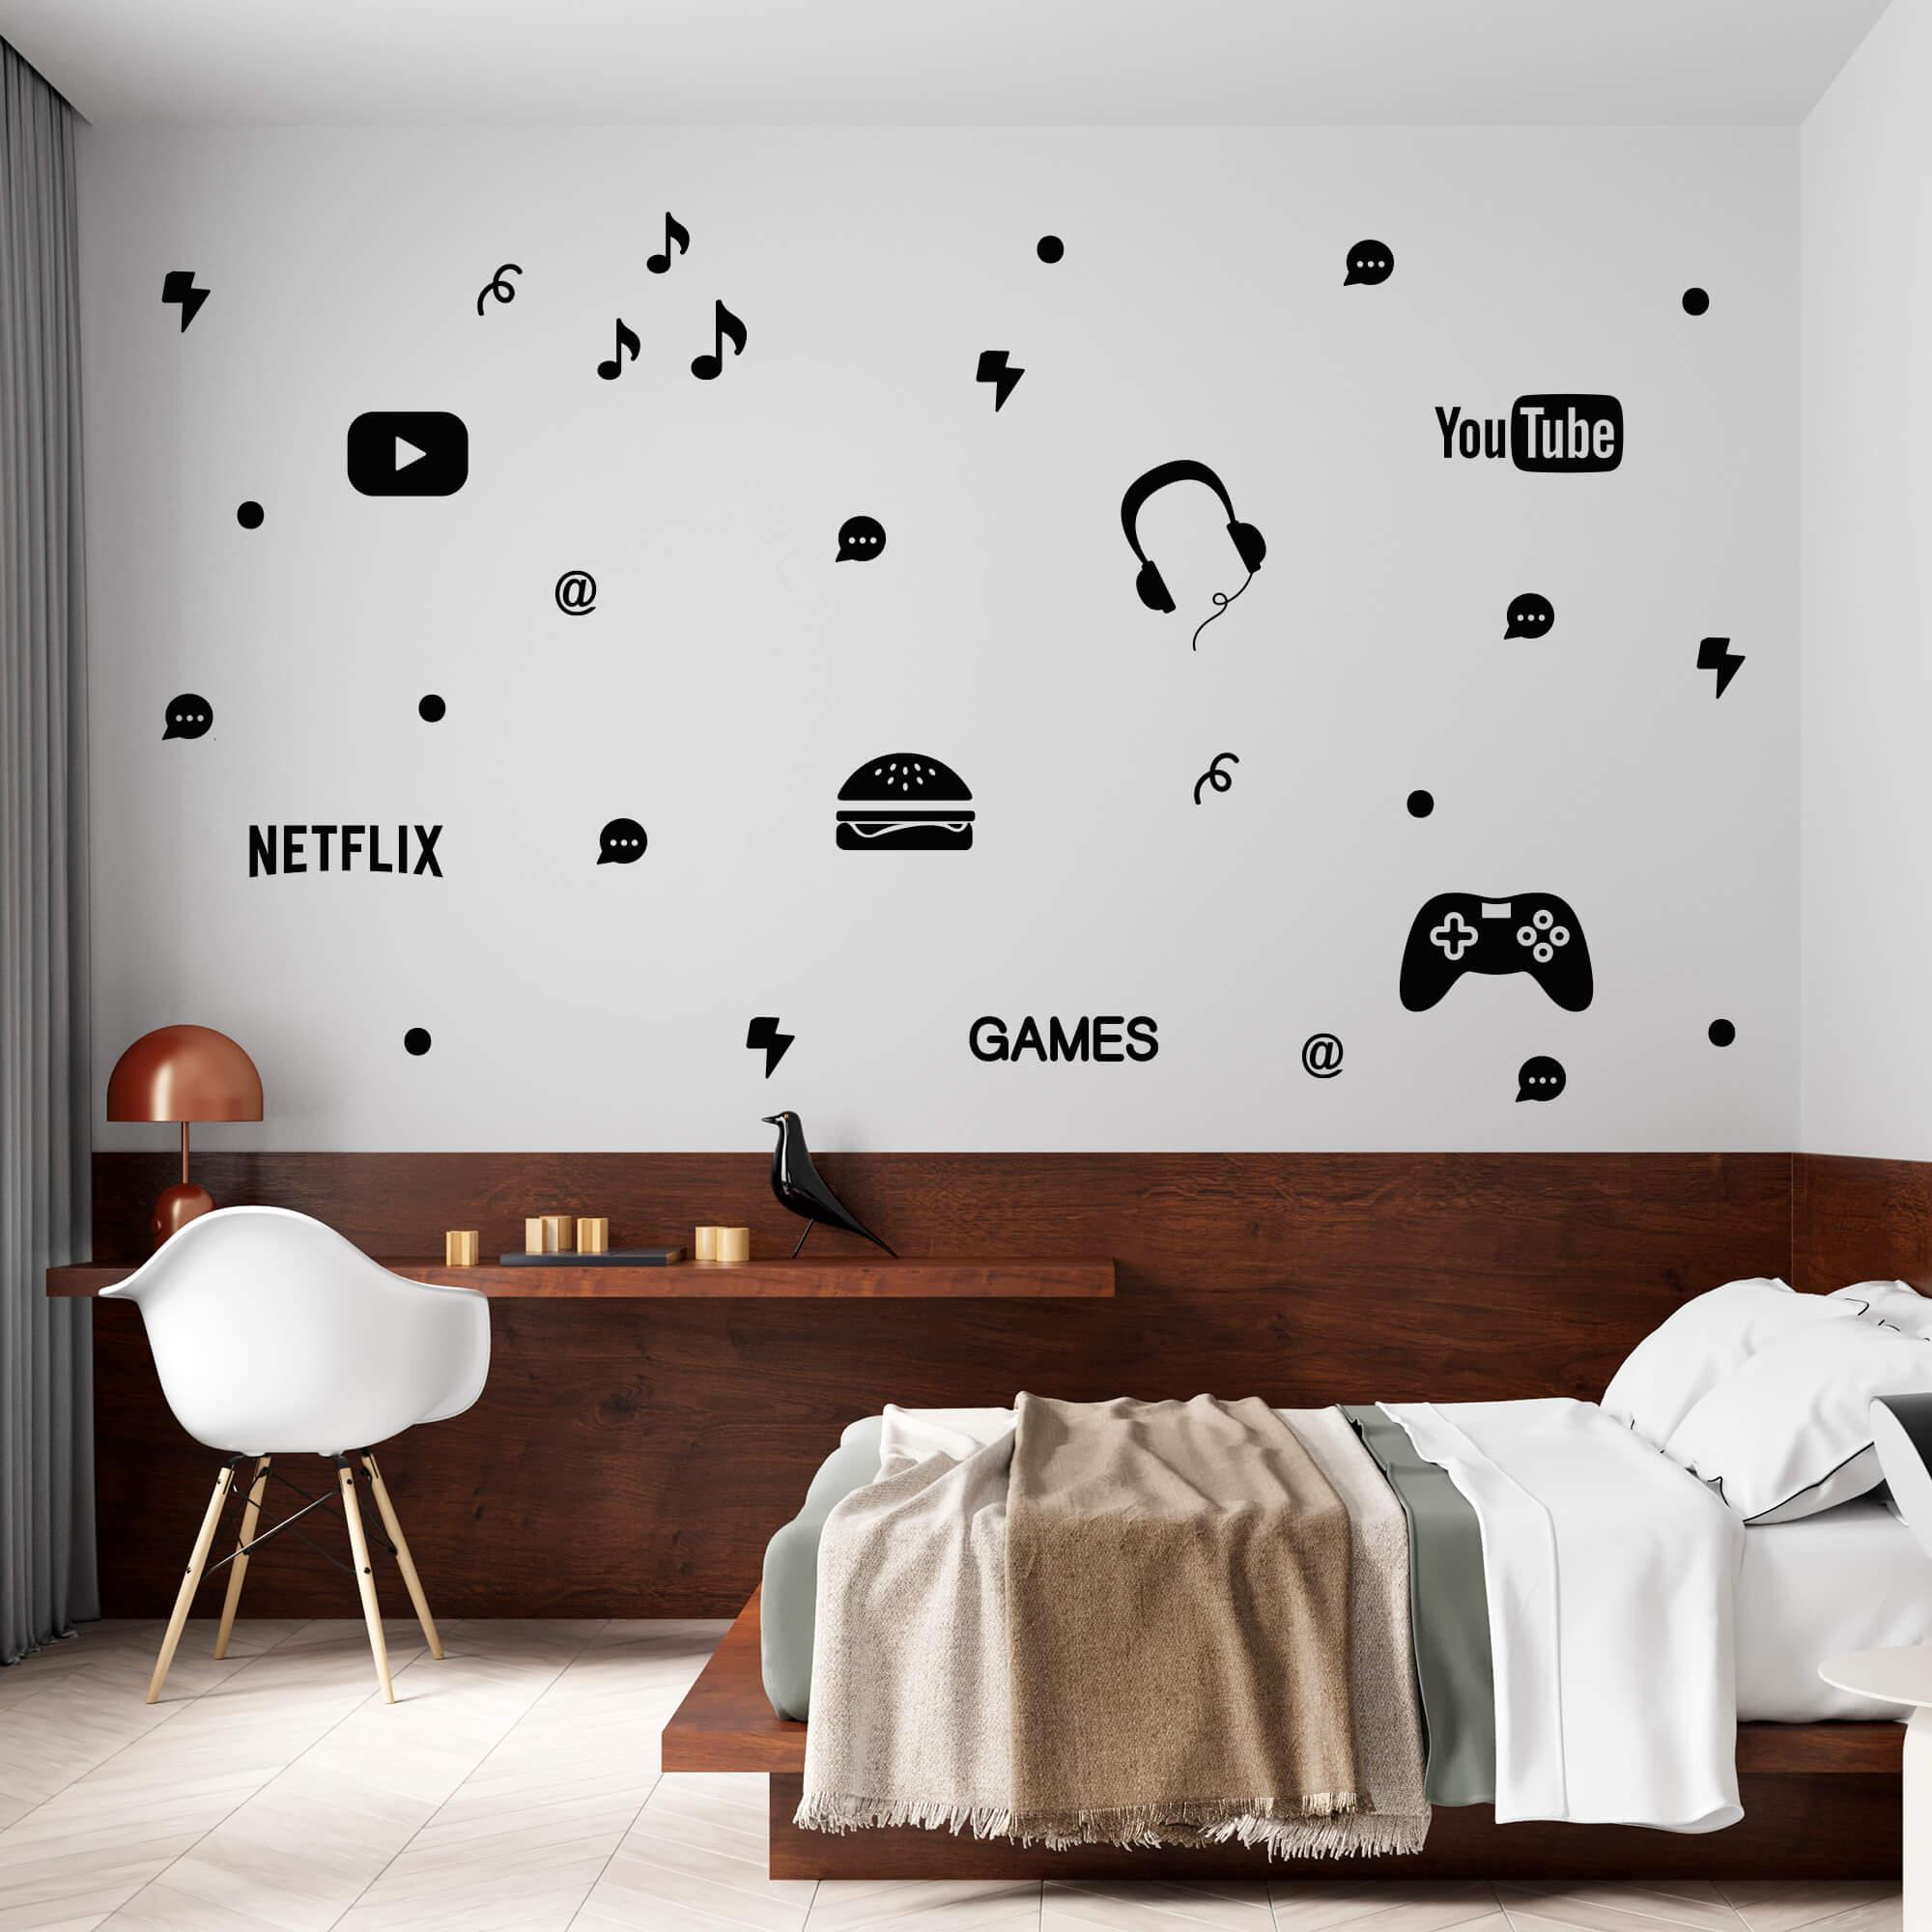 Kit de Adesivos Mundo Adolescente Gamer Elementos Internet